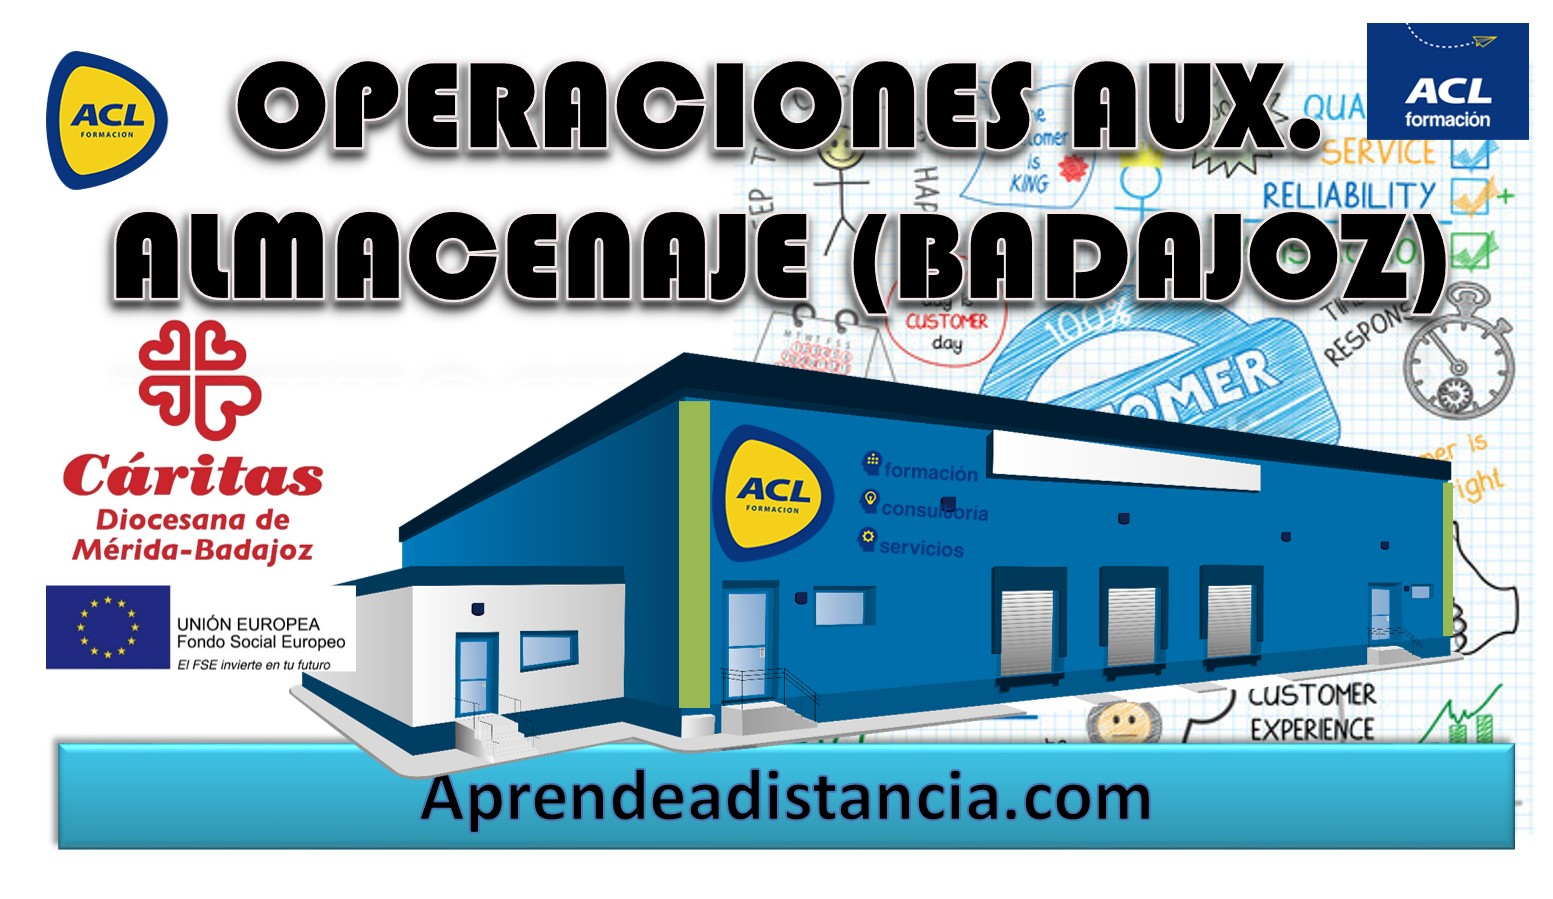 (BADAJOZ CÁRITAS) OPERACIONES AUXILIARES DE ALMACENAJE